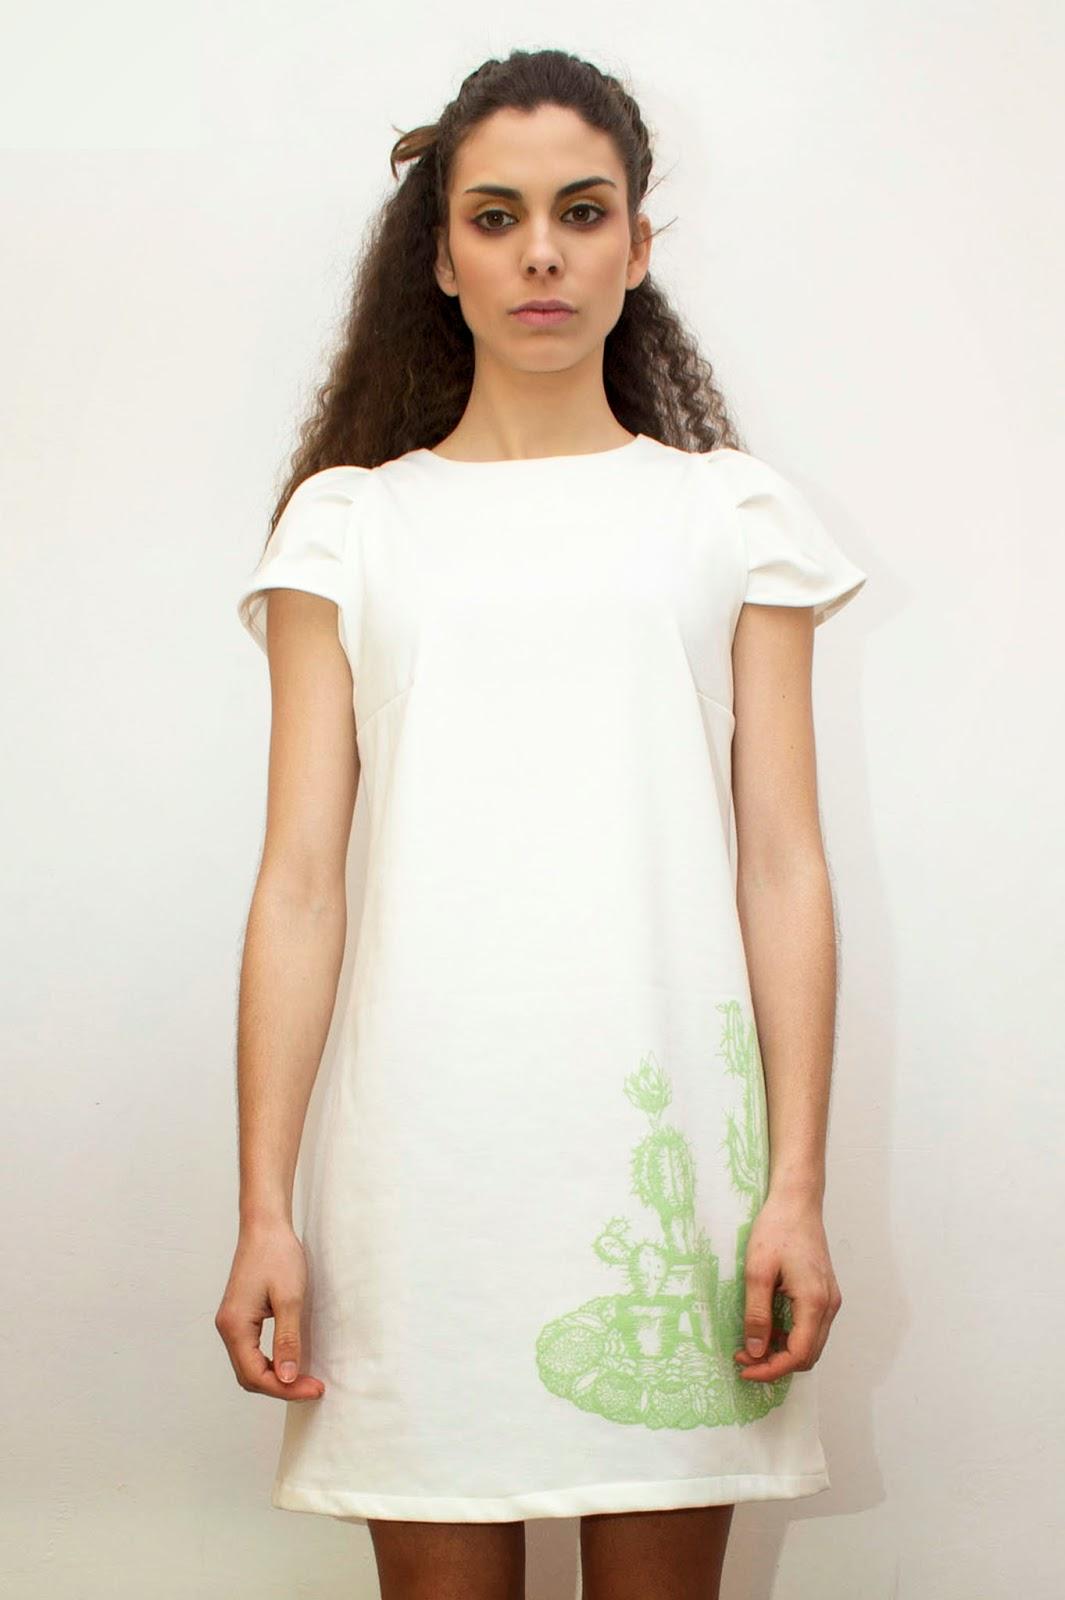 http://labocoqueshop.bigcartel.com/product/vestido-cactus-blanco#.U2owpqK1vA4